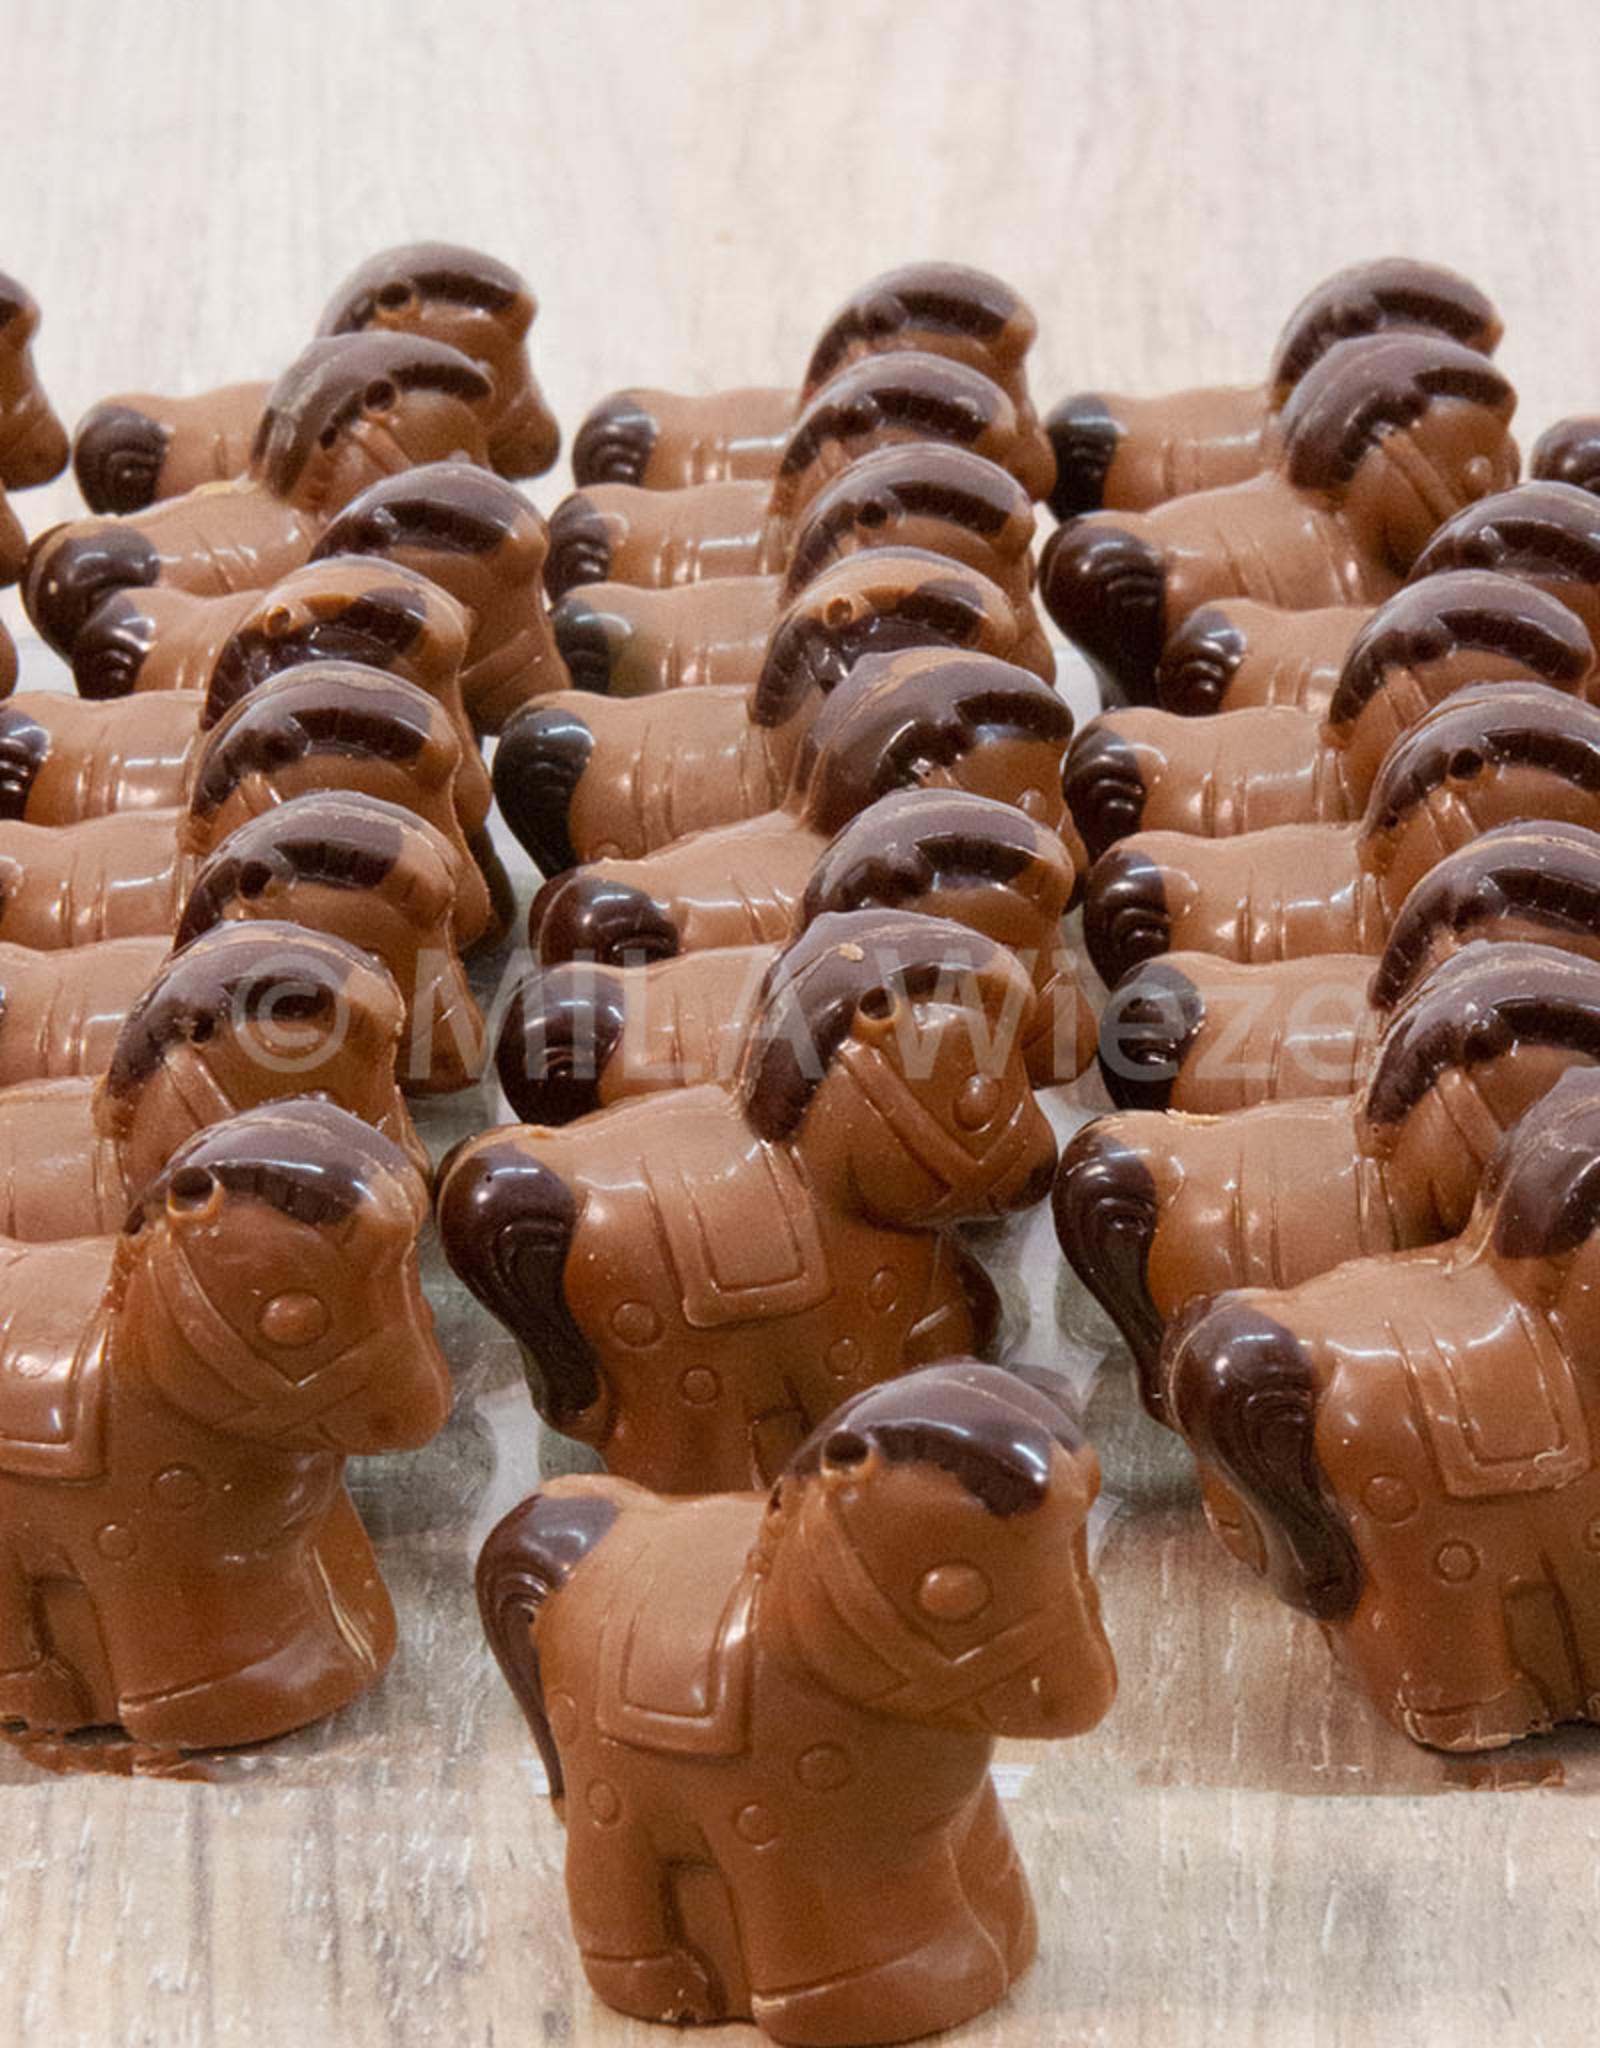 Paardje met praliné vulling - 7 stuks